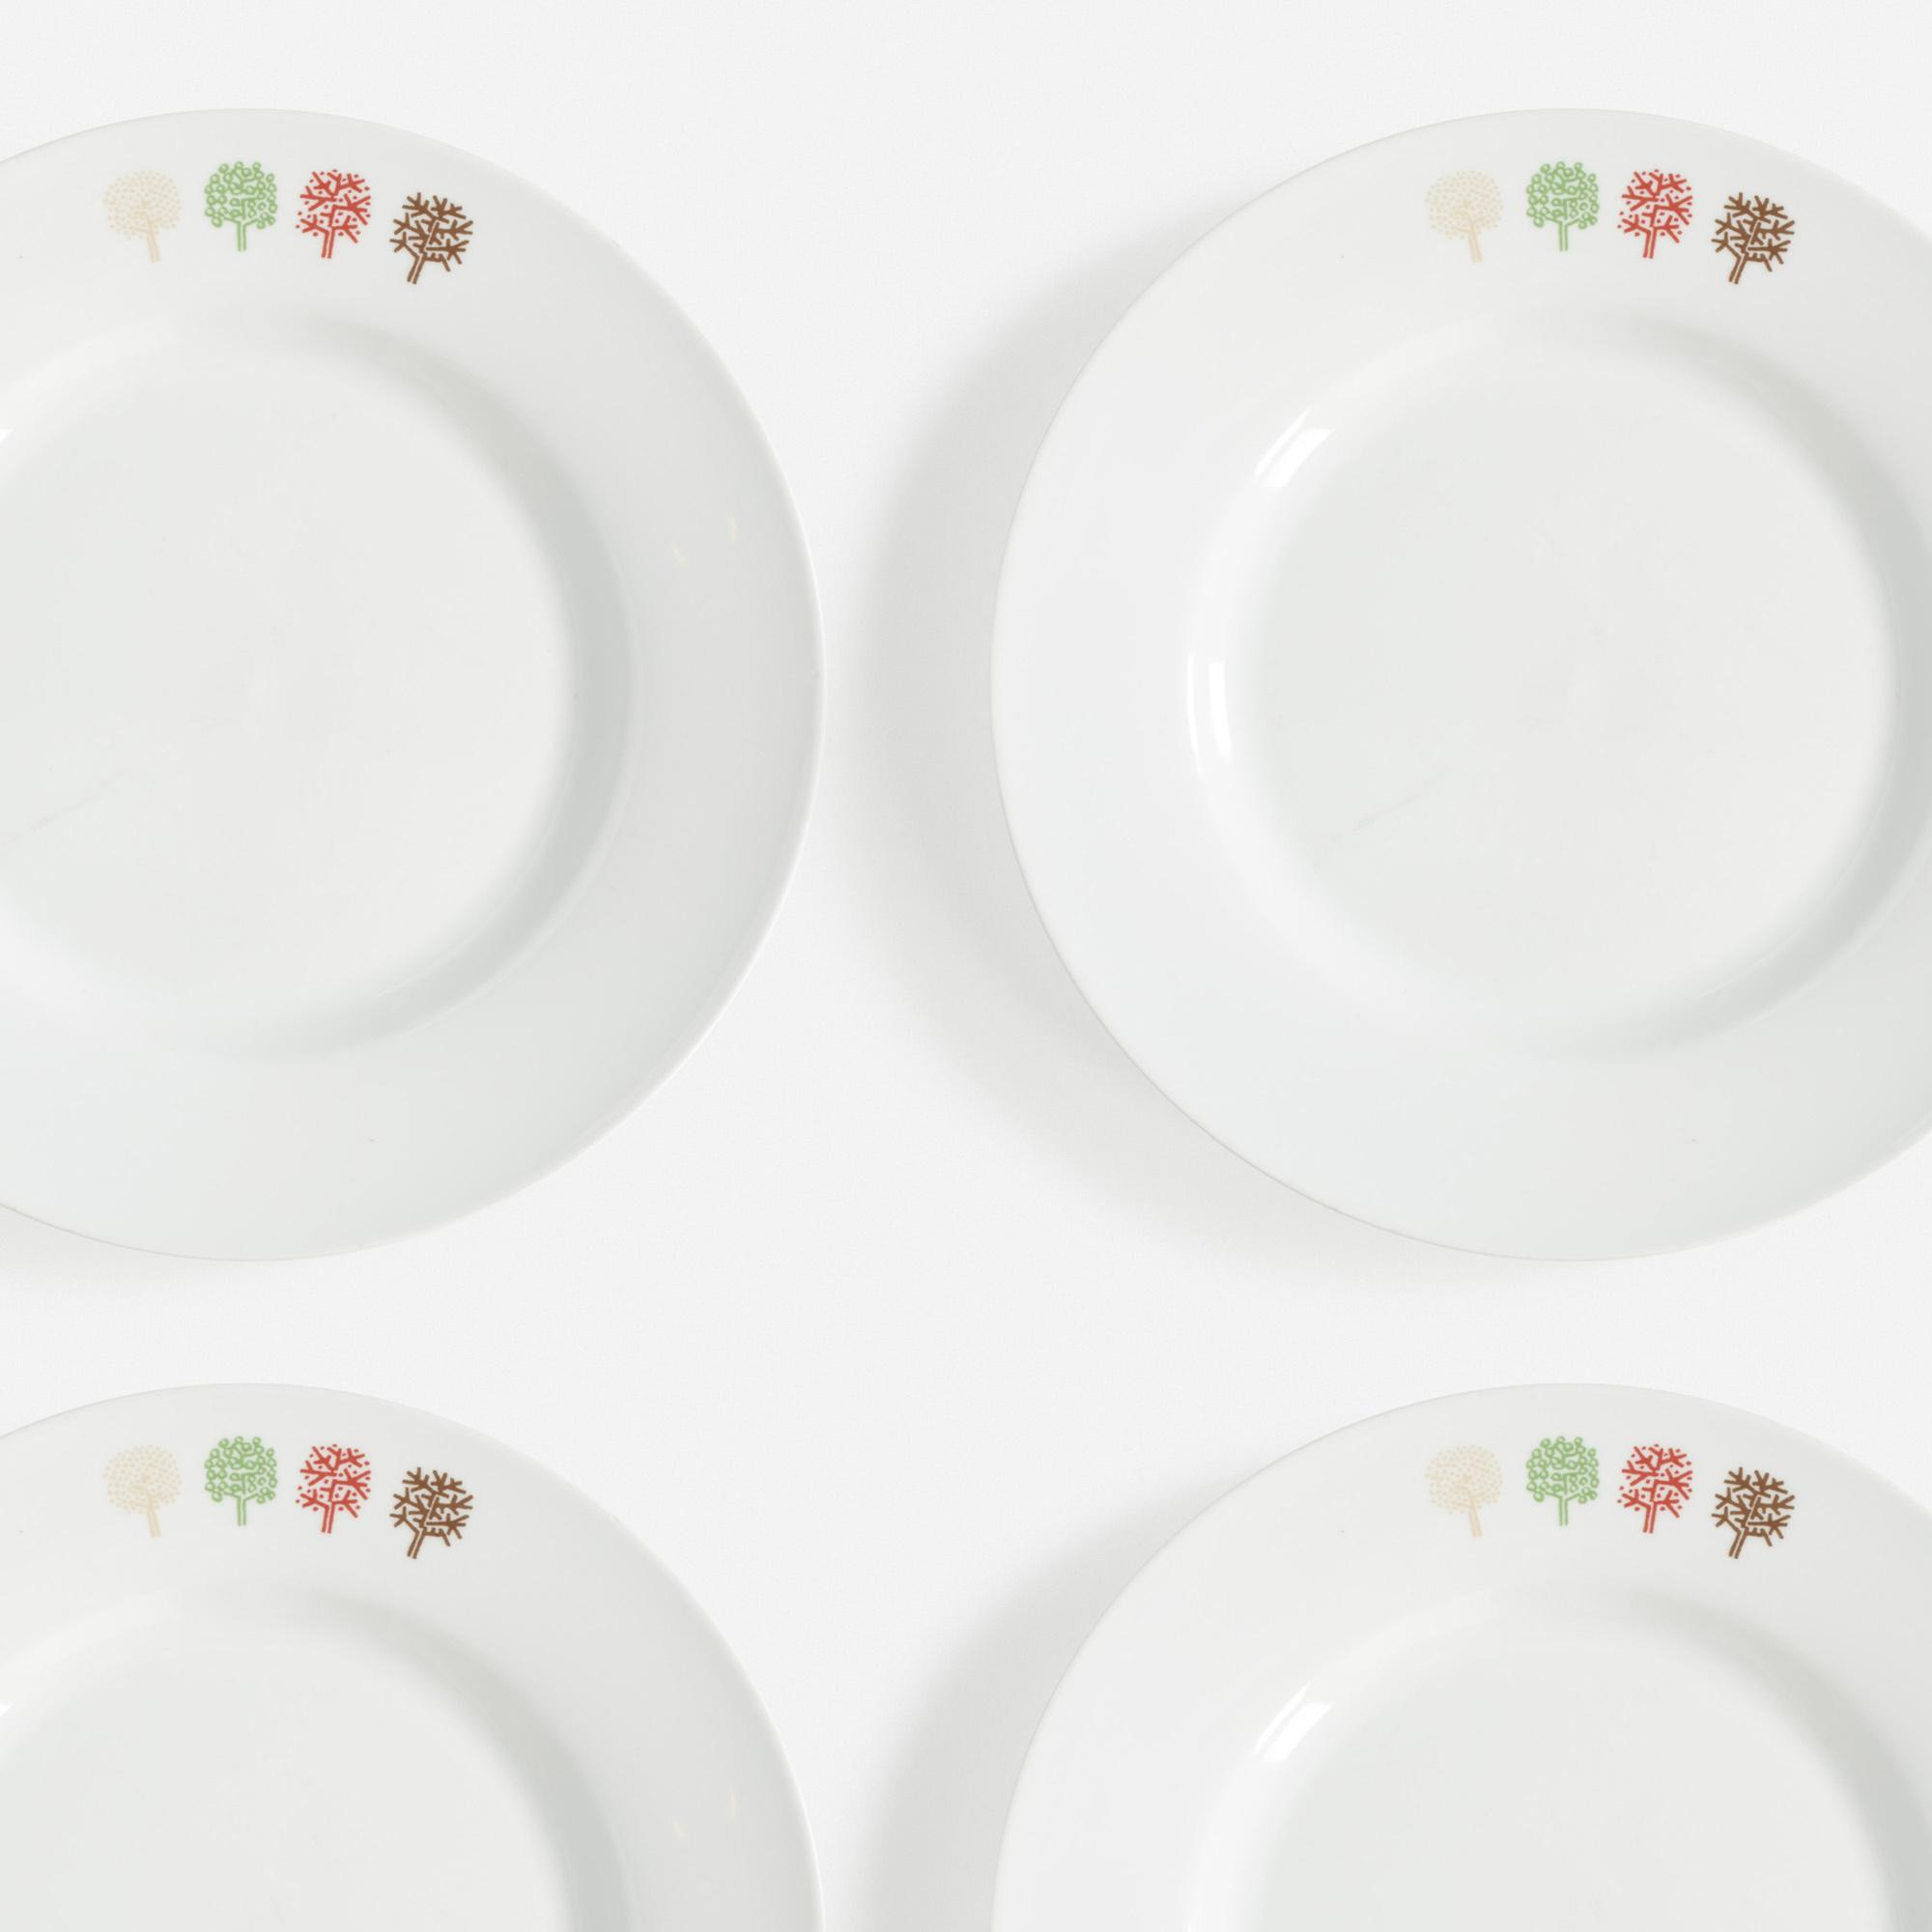 734:  / Four Seasons plates, set of twelve (1 of 1)